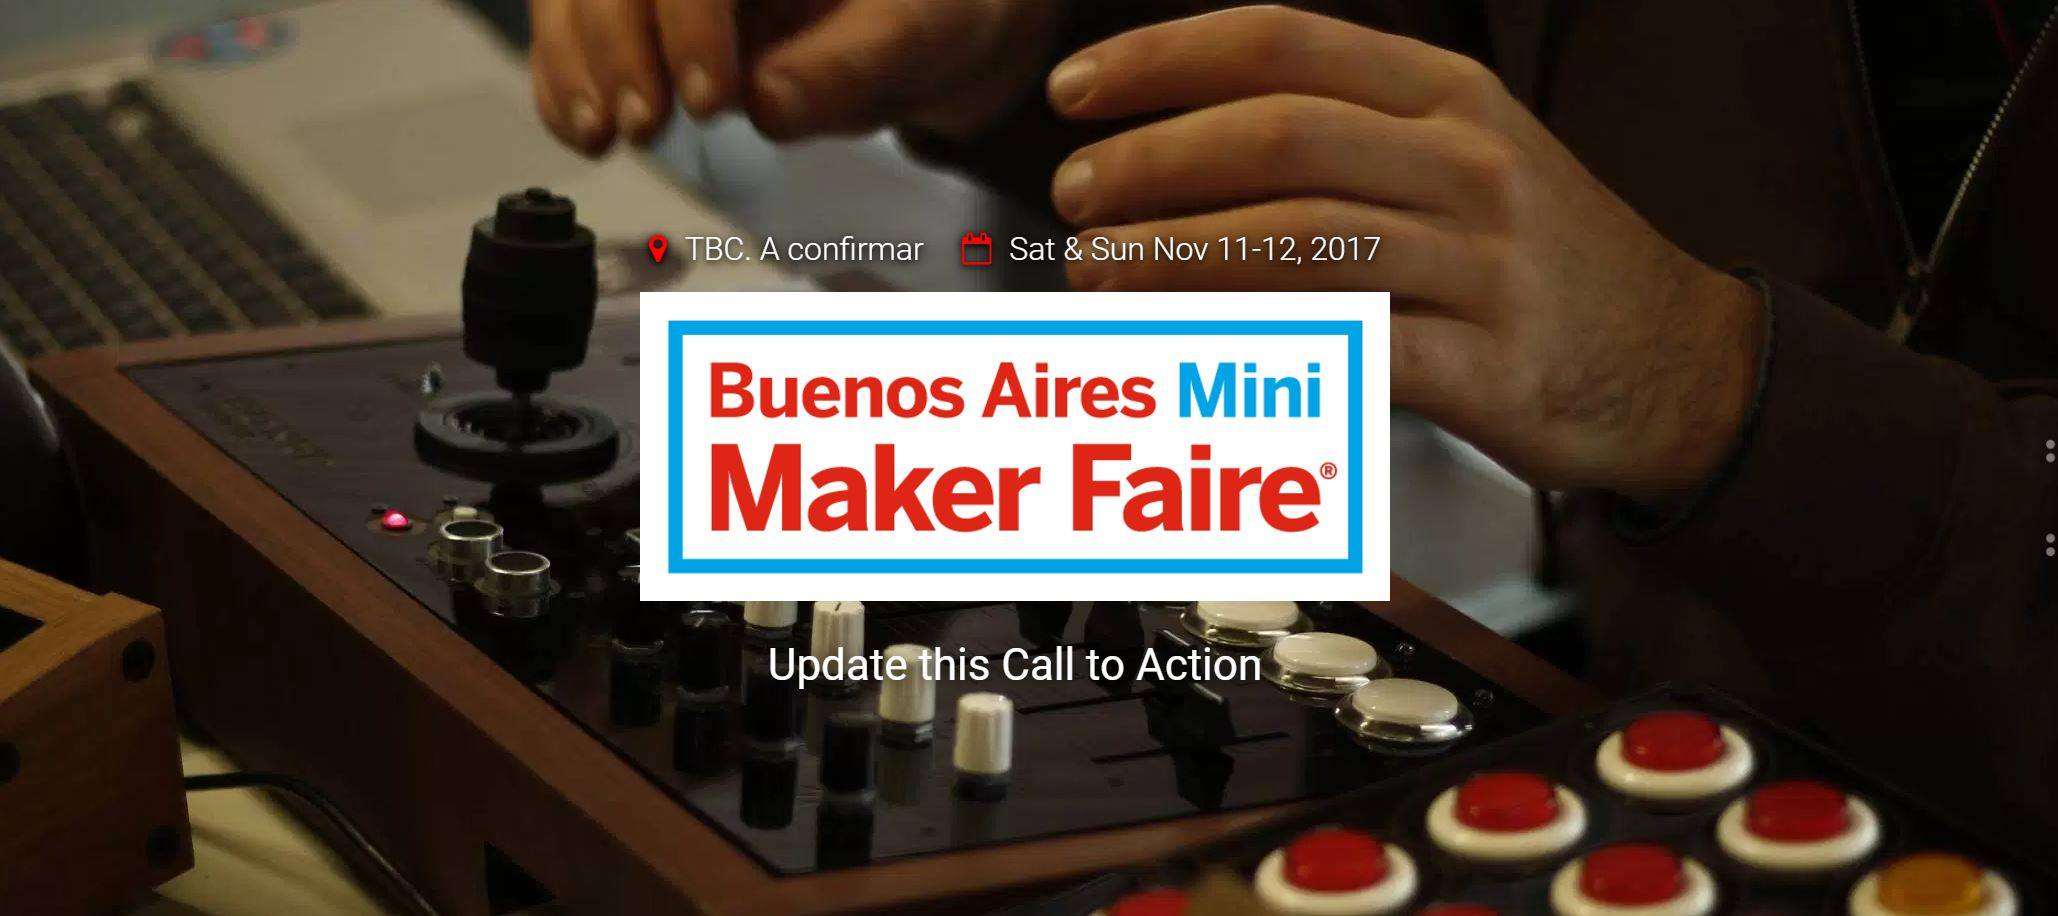 Buenos Aires Maker Faire